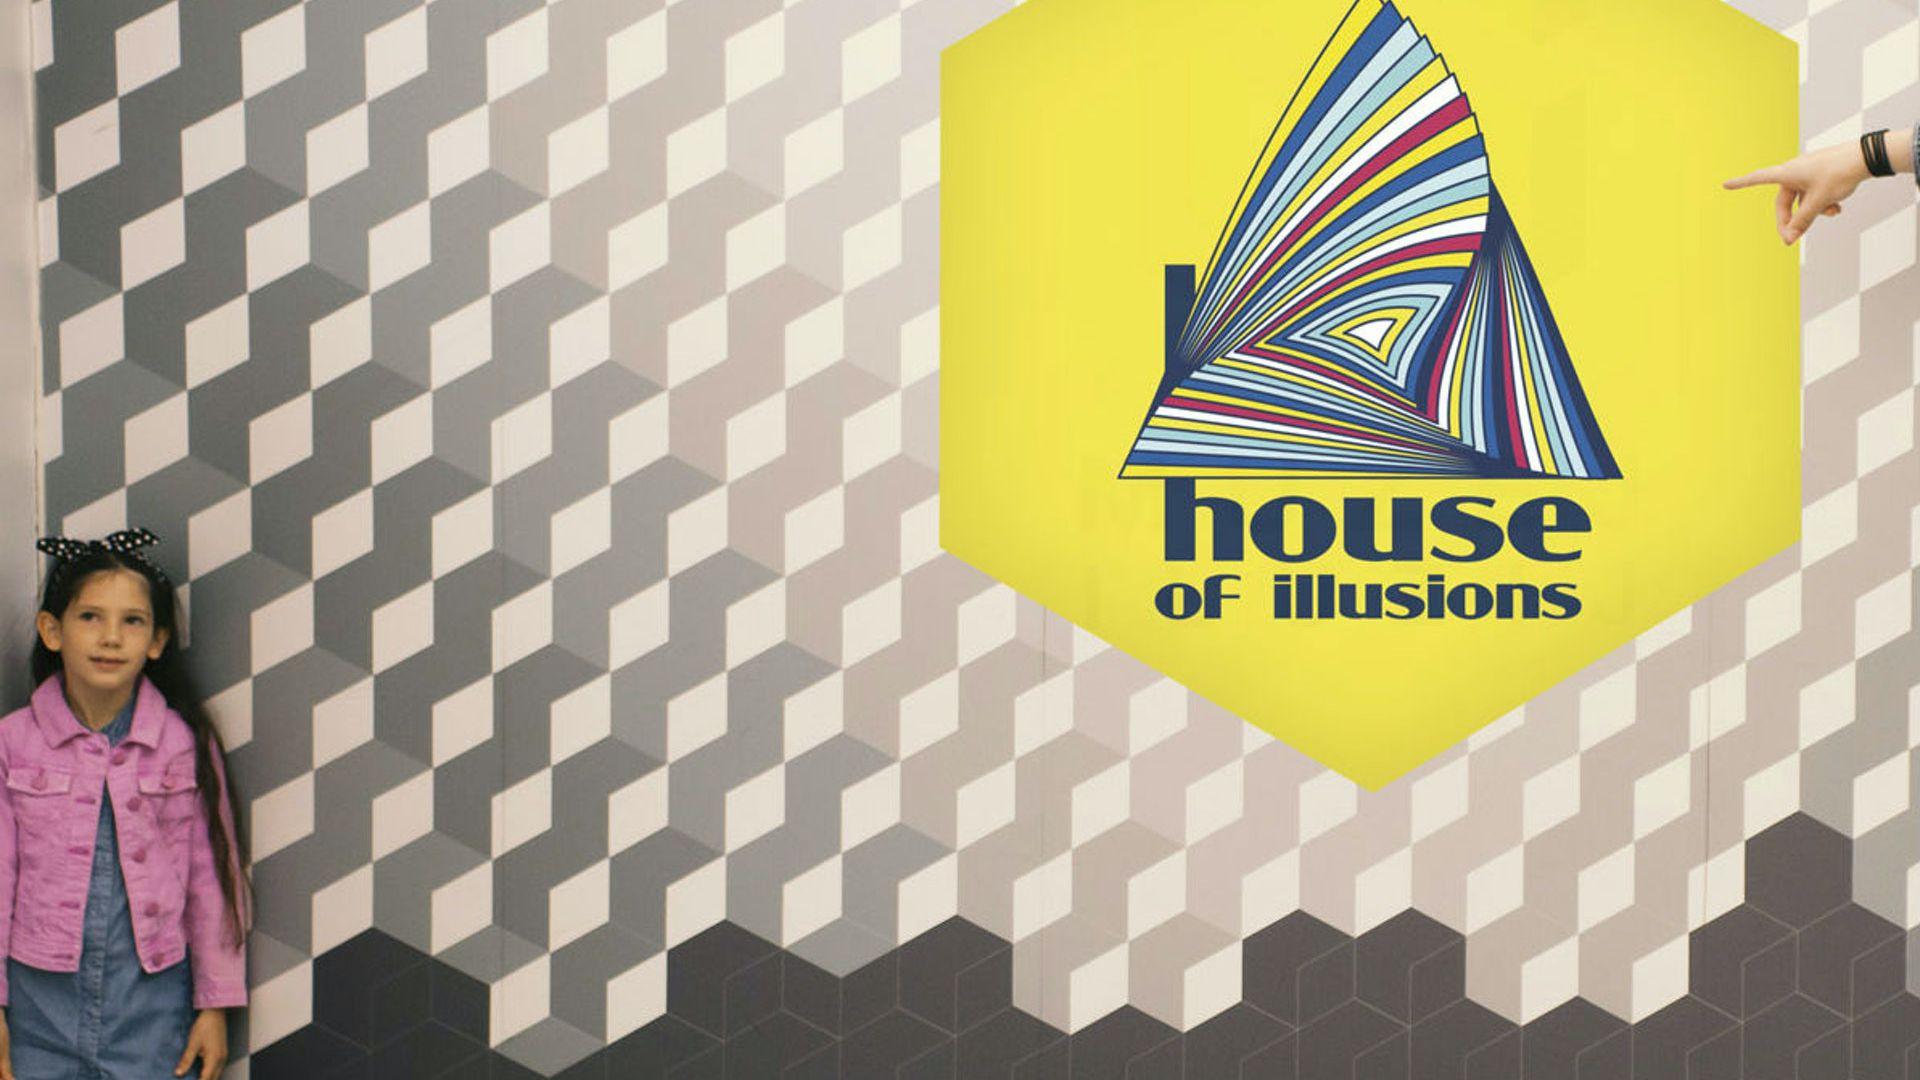 House of Illusions Ljubljana